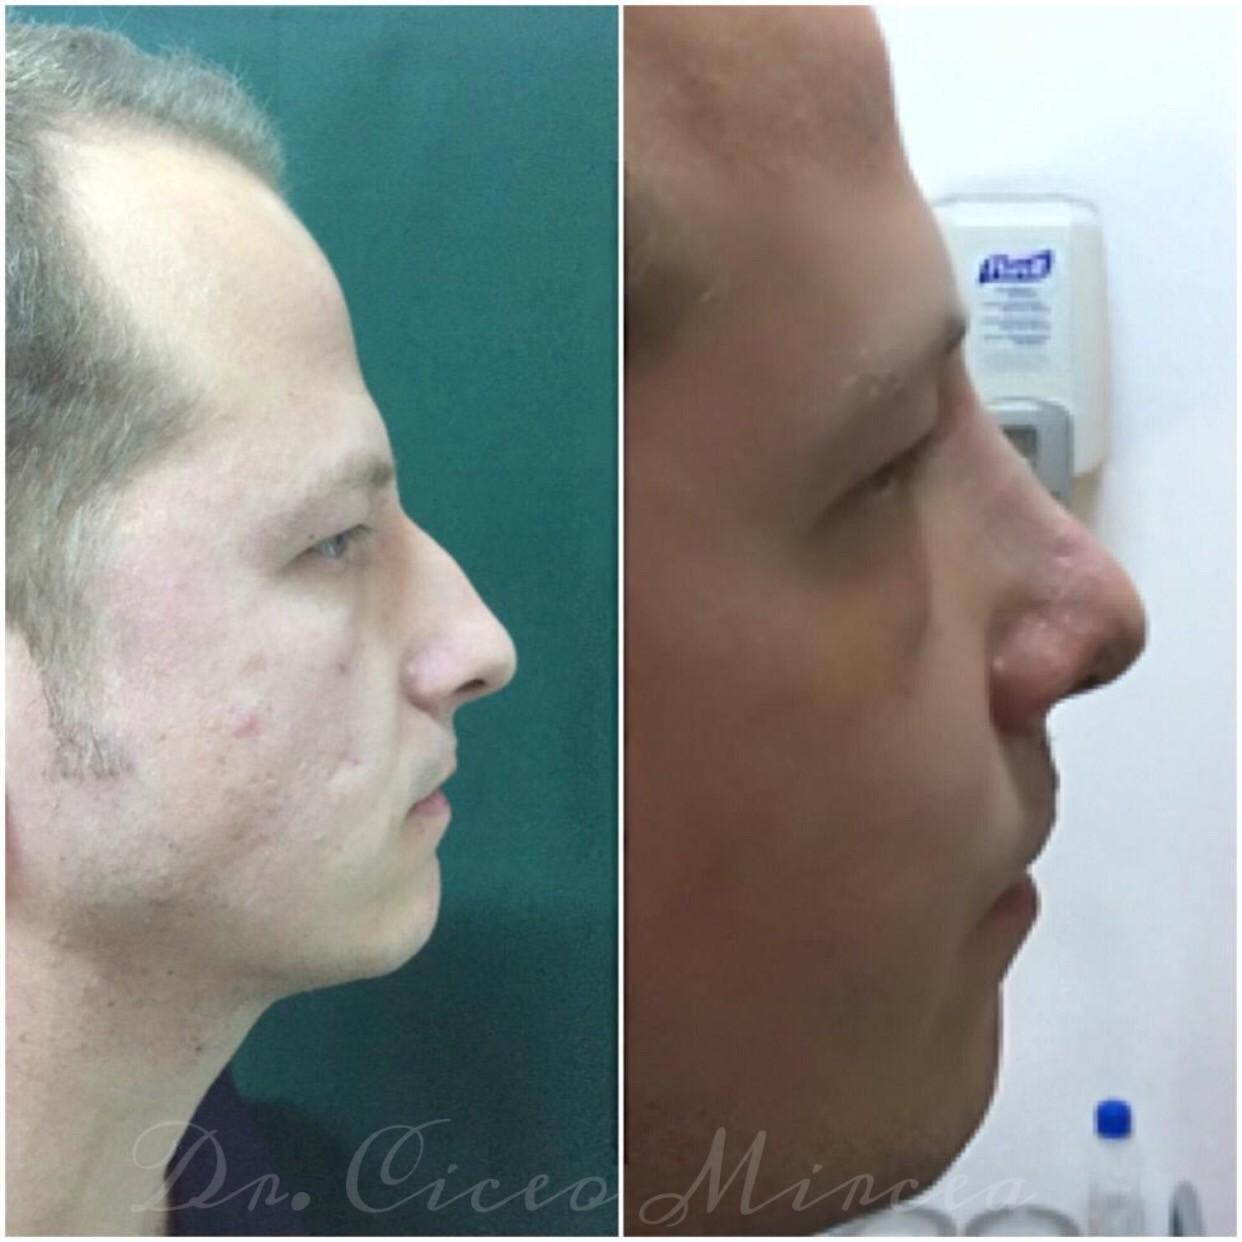 rinoplastie Cluj, chirurgie estetica clinica Medestet, dr Mircea Ciceo